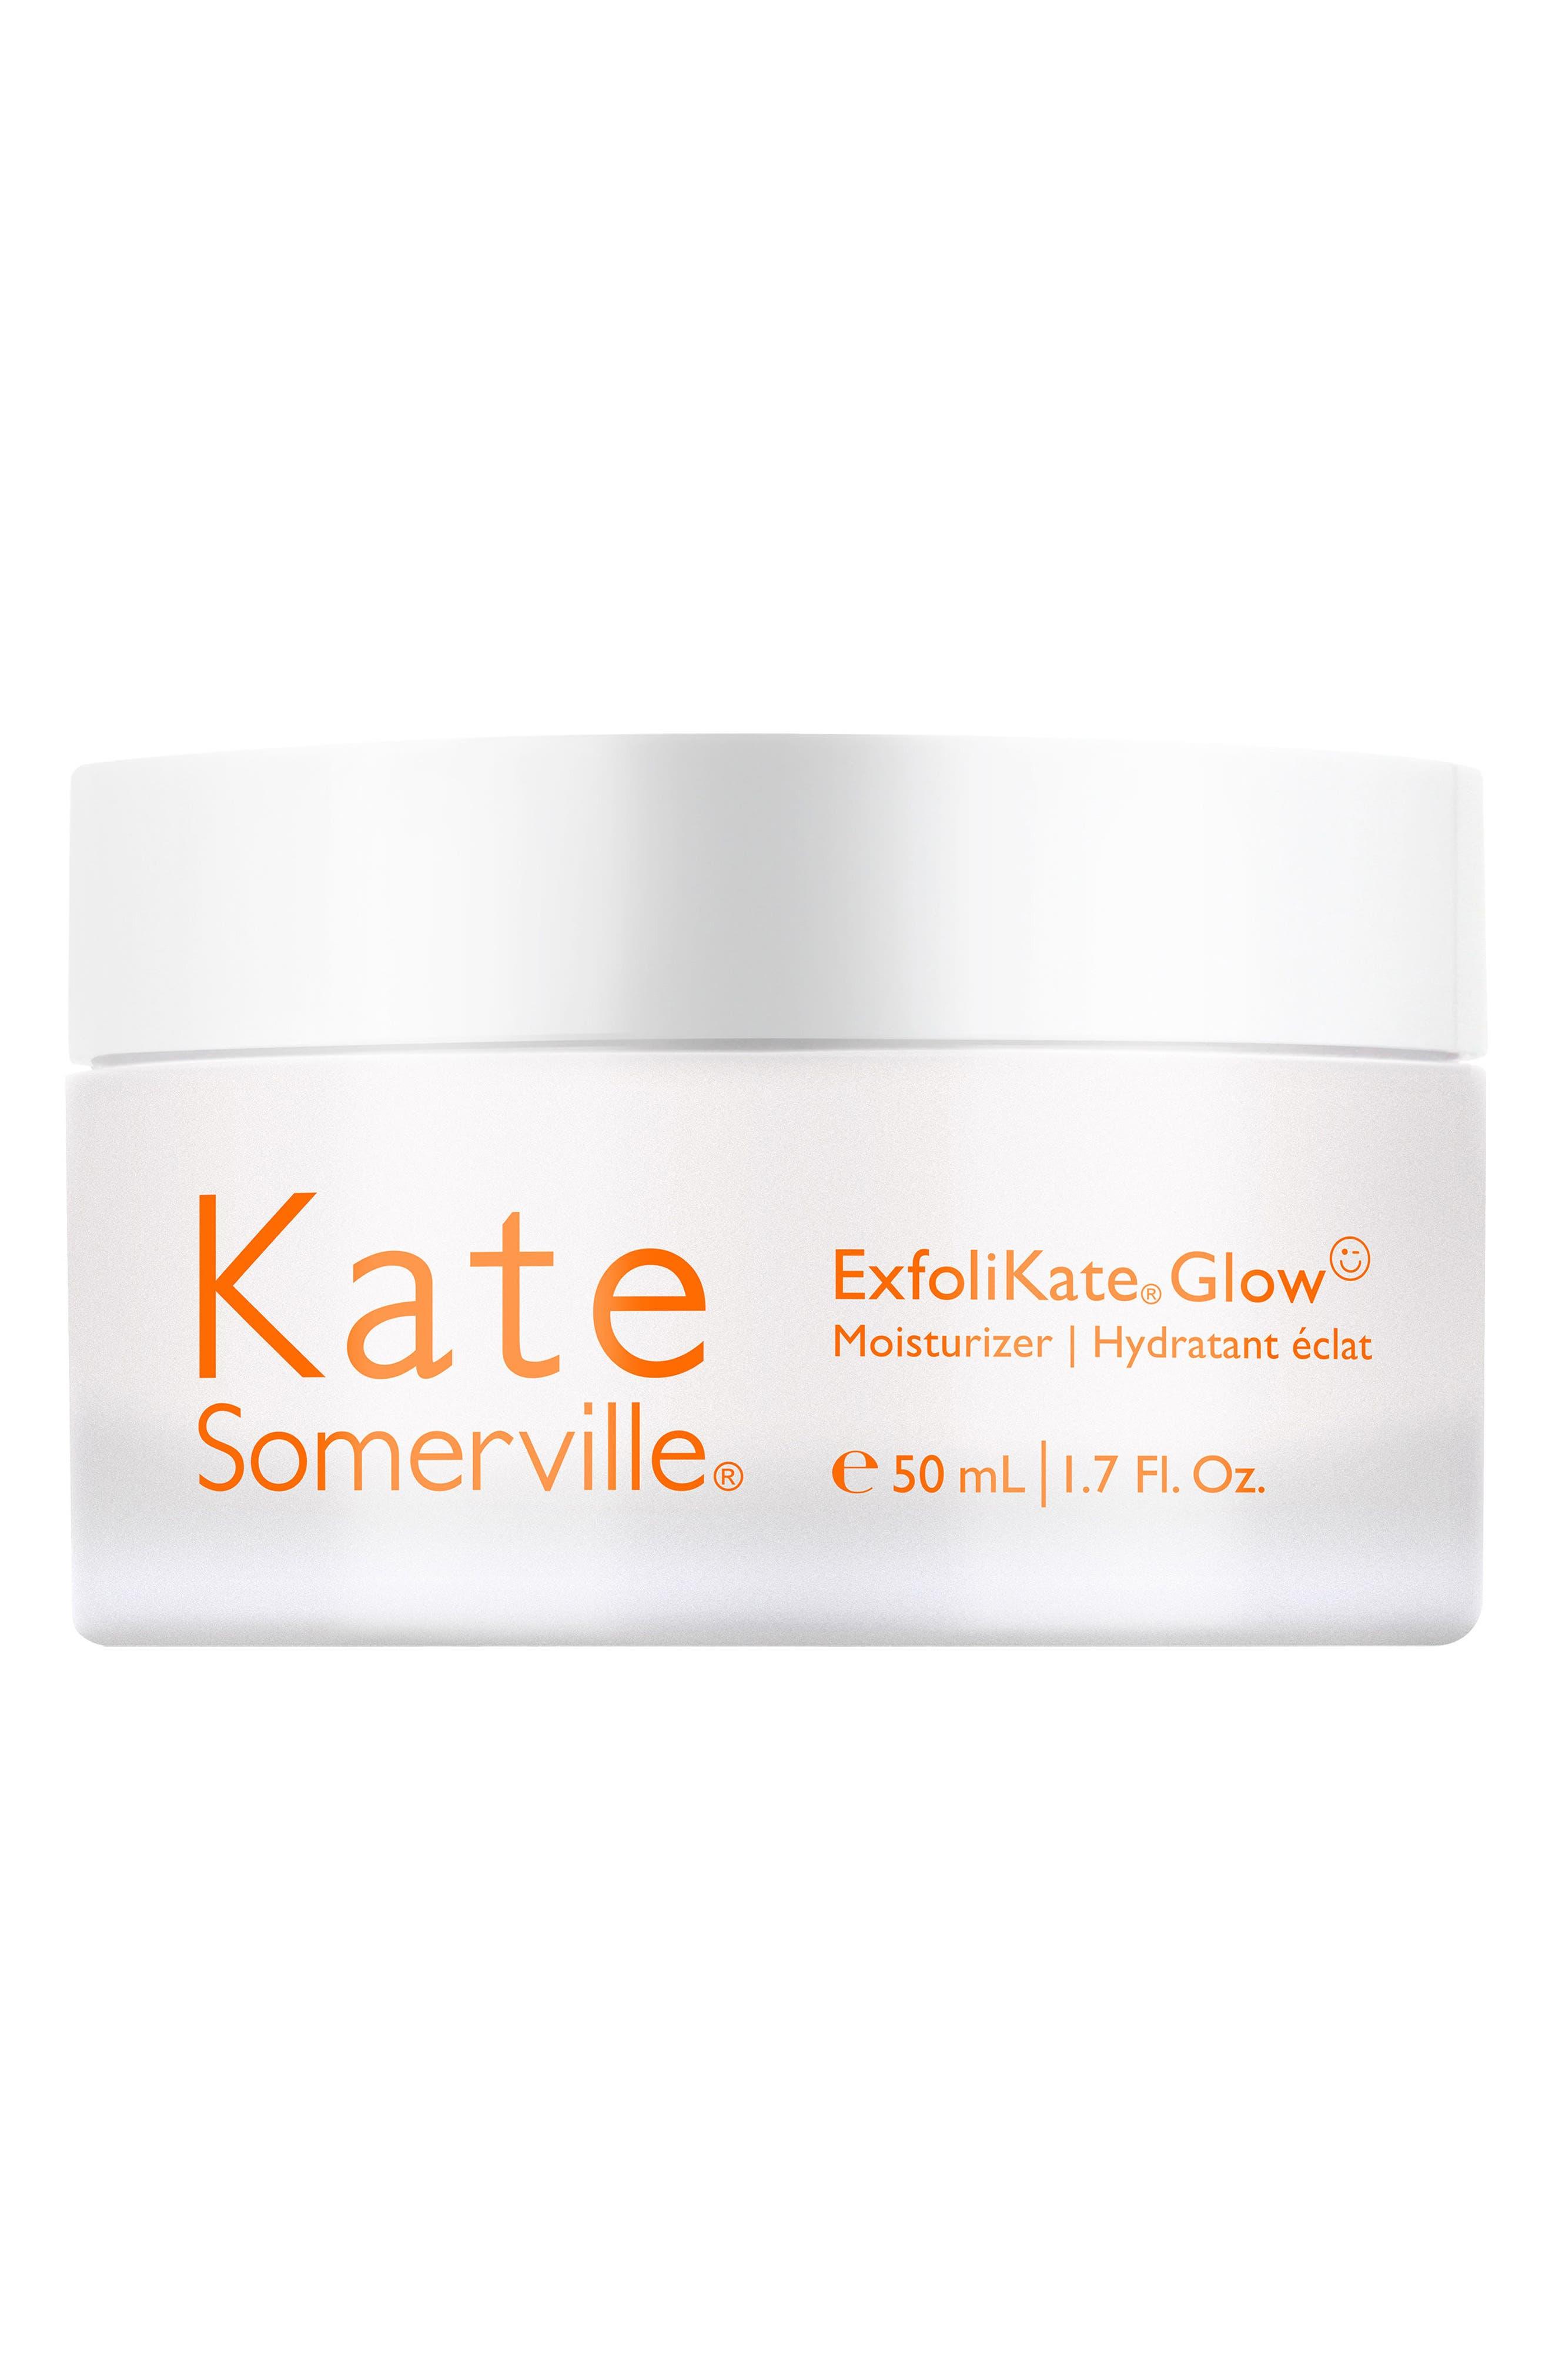 Kate Somerville® ExfoliKate® Glow Moisturizer